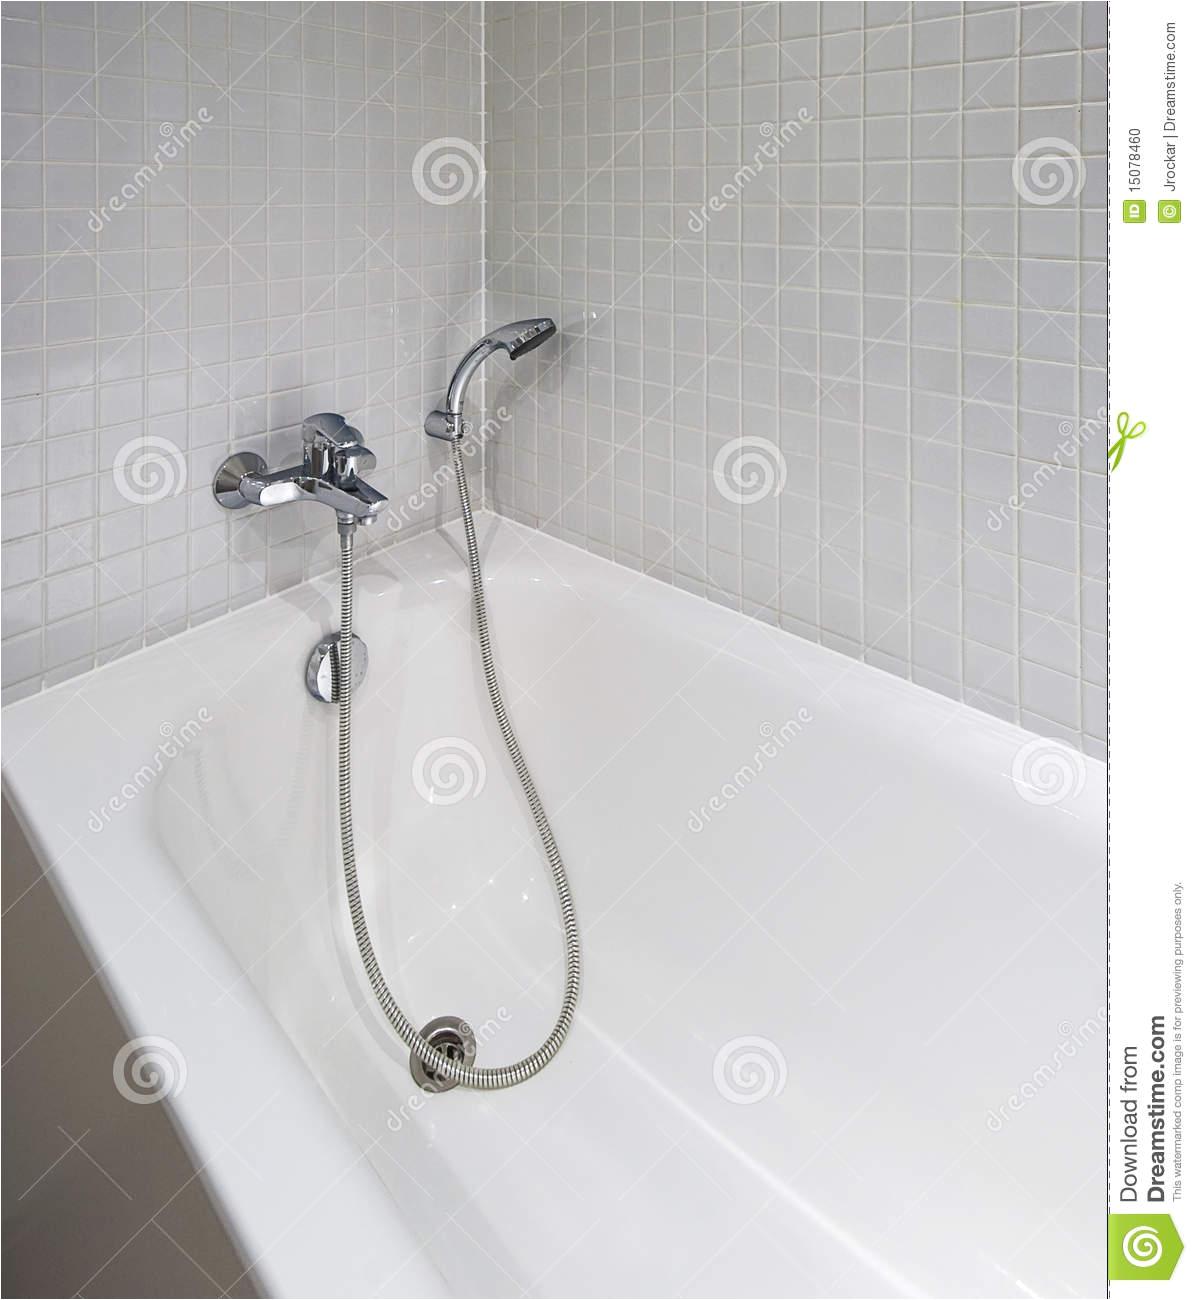 stock photo bath tub shower attachment image